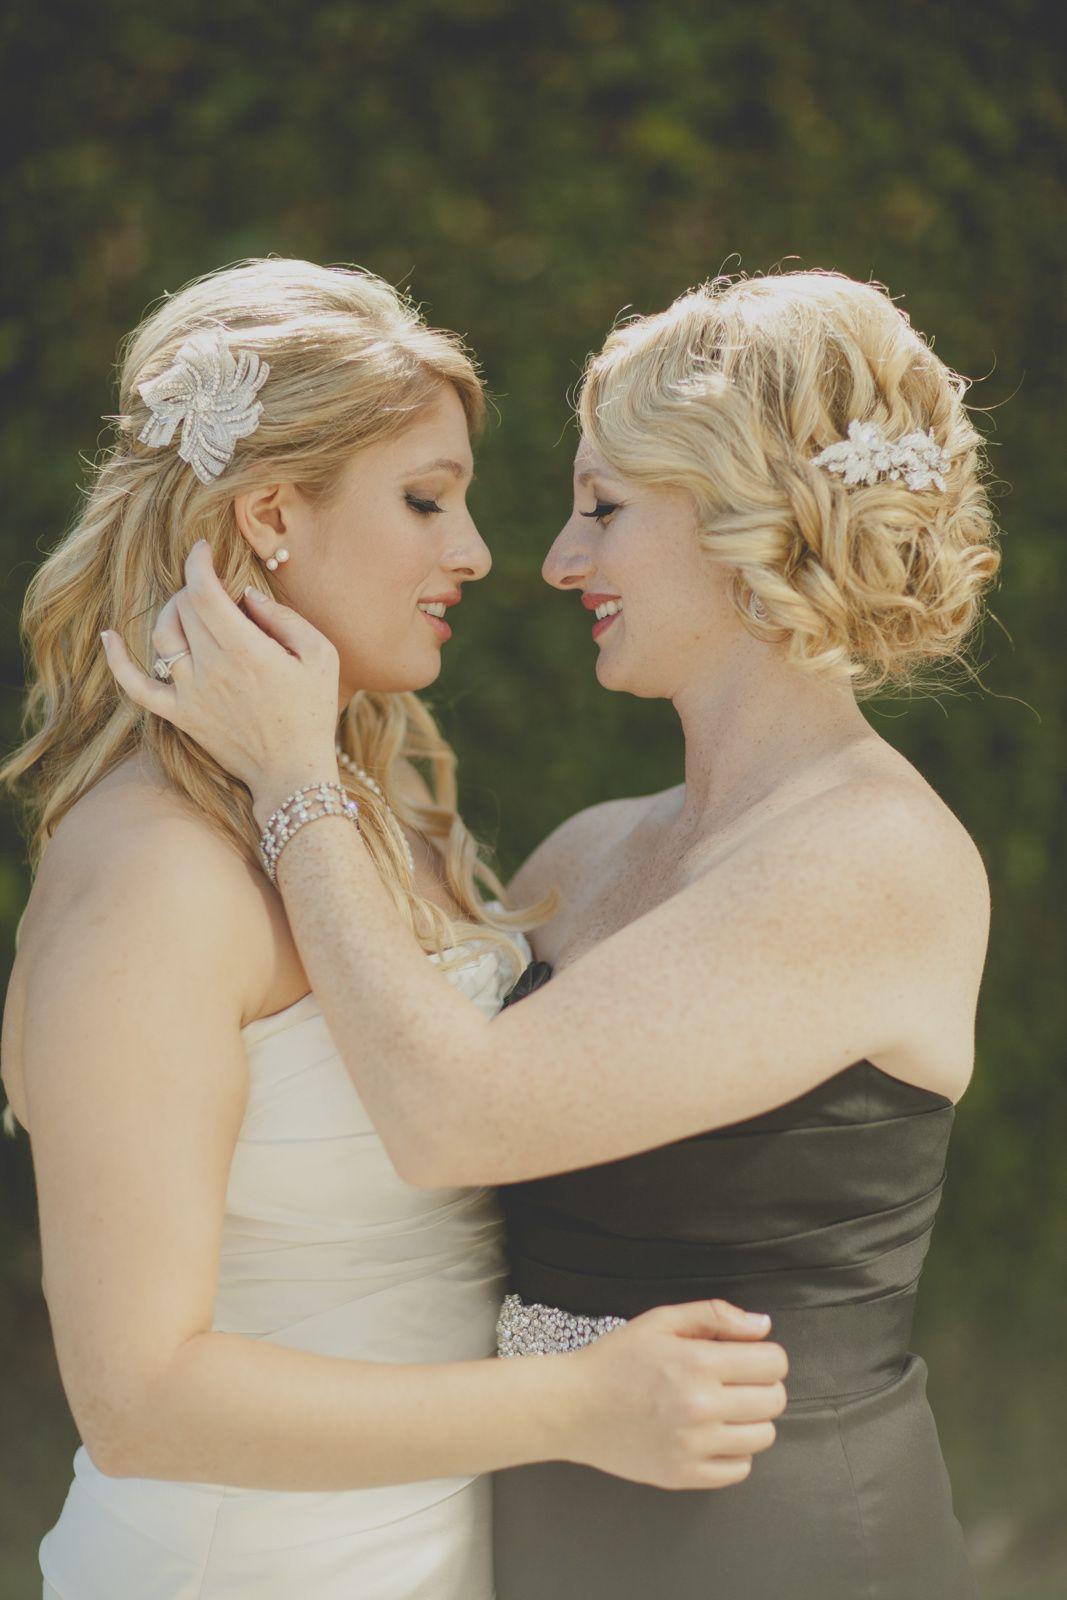 Lesbian wedding   Lesbian Weddings   Pinterest